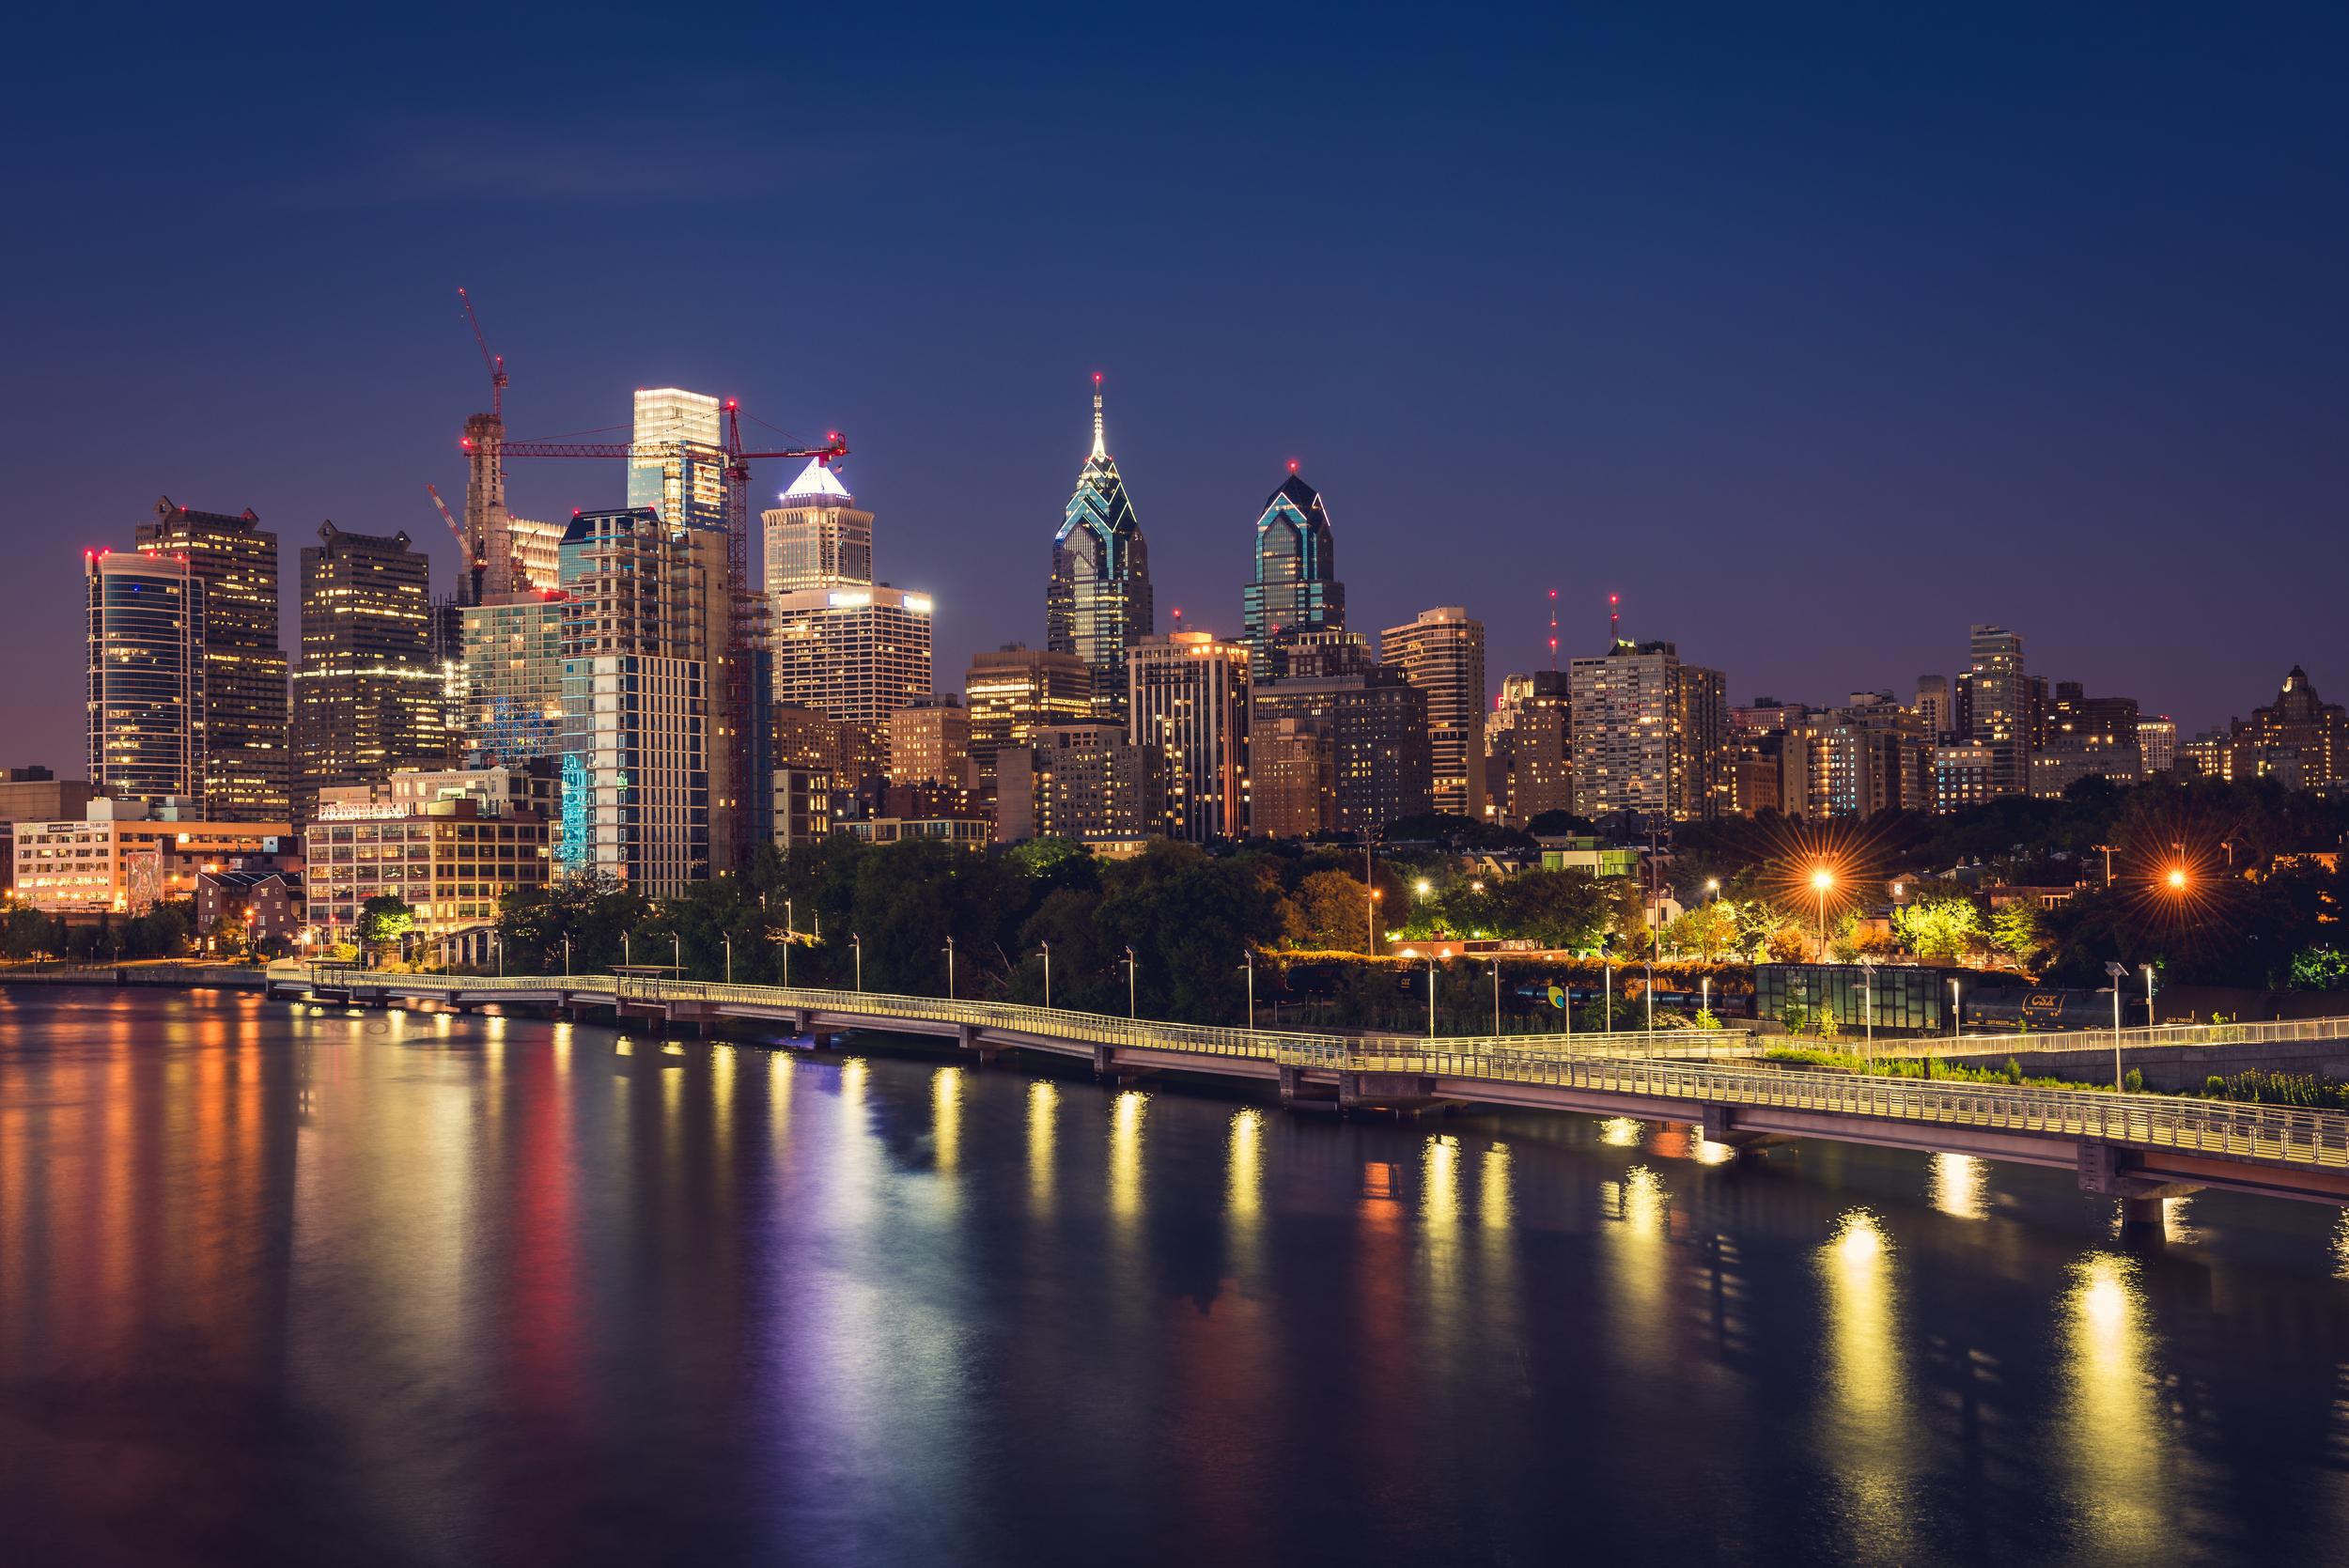 20160626 - Philly Skyline LR-7.jpg